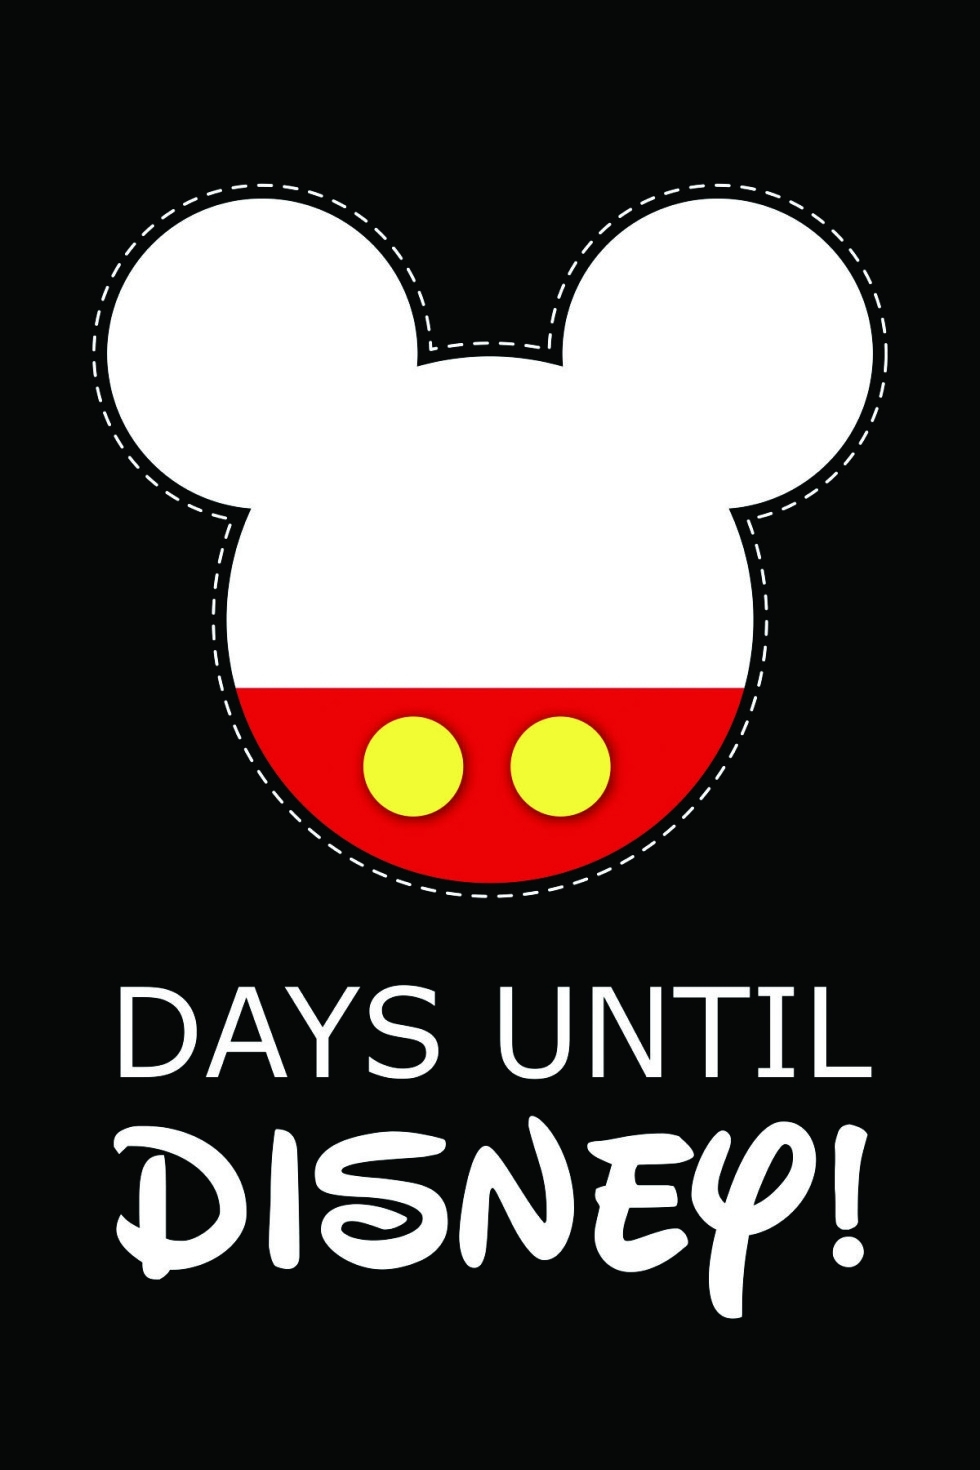 10 Fun Printable Disney Countdown Calendars | Kittybabylove regarding 99 Days To Disney Printable Calendar